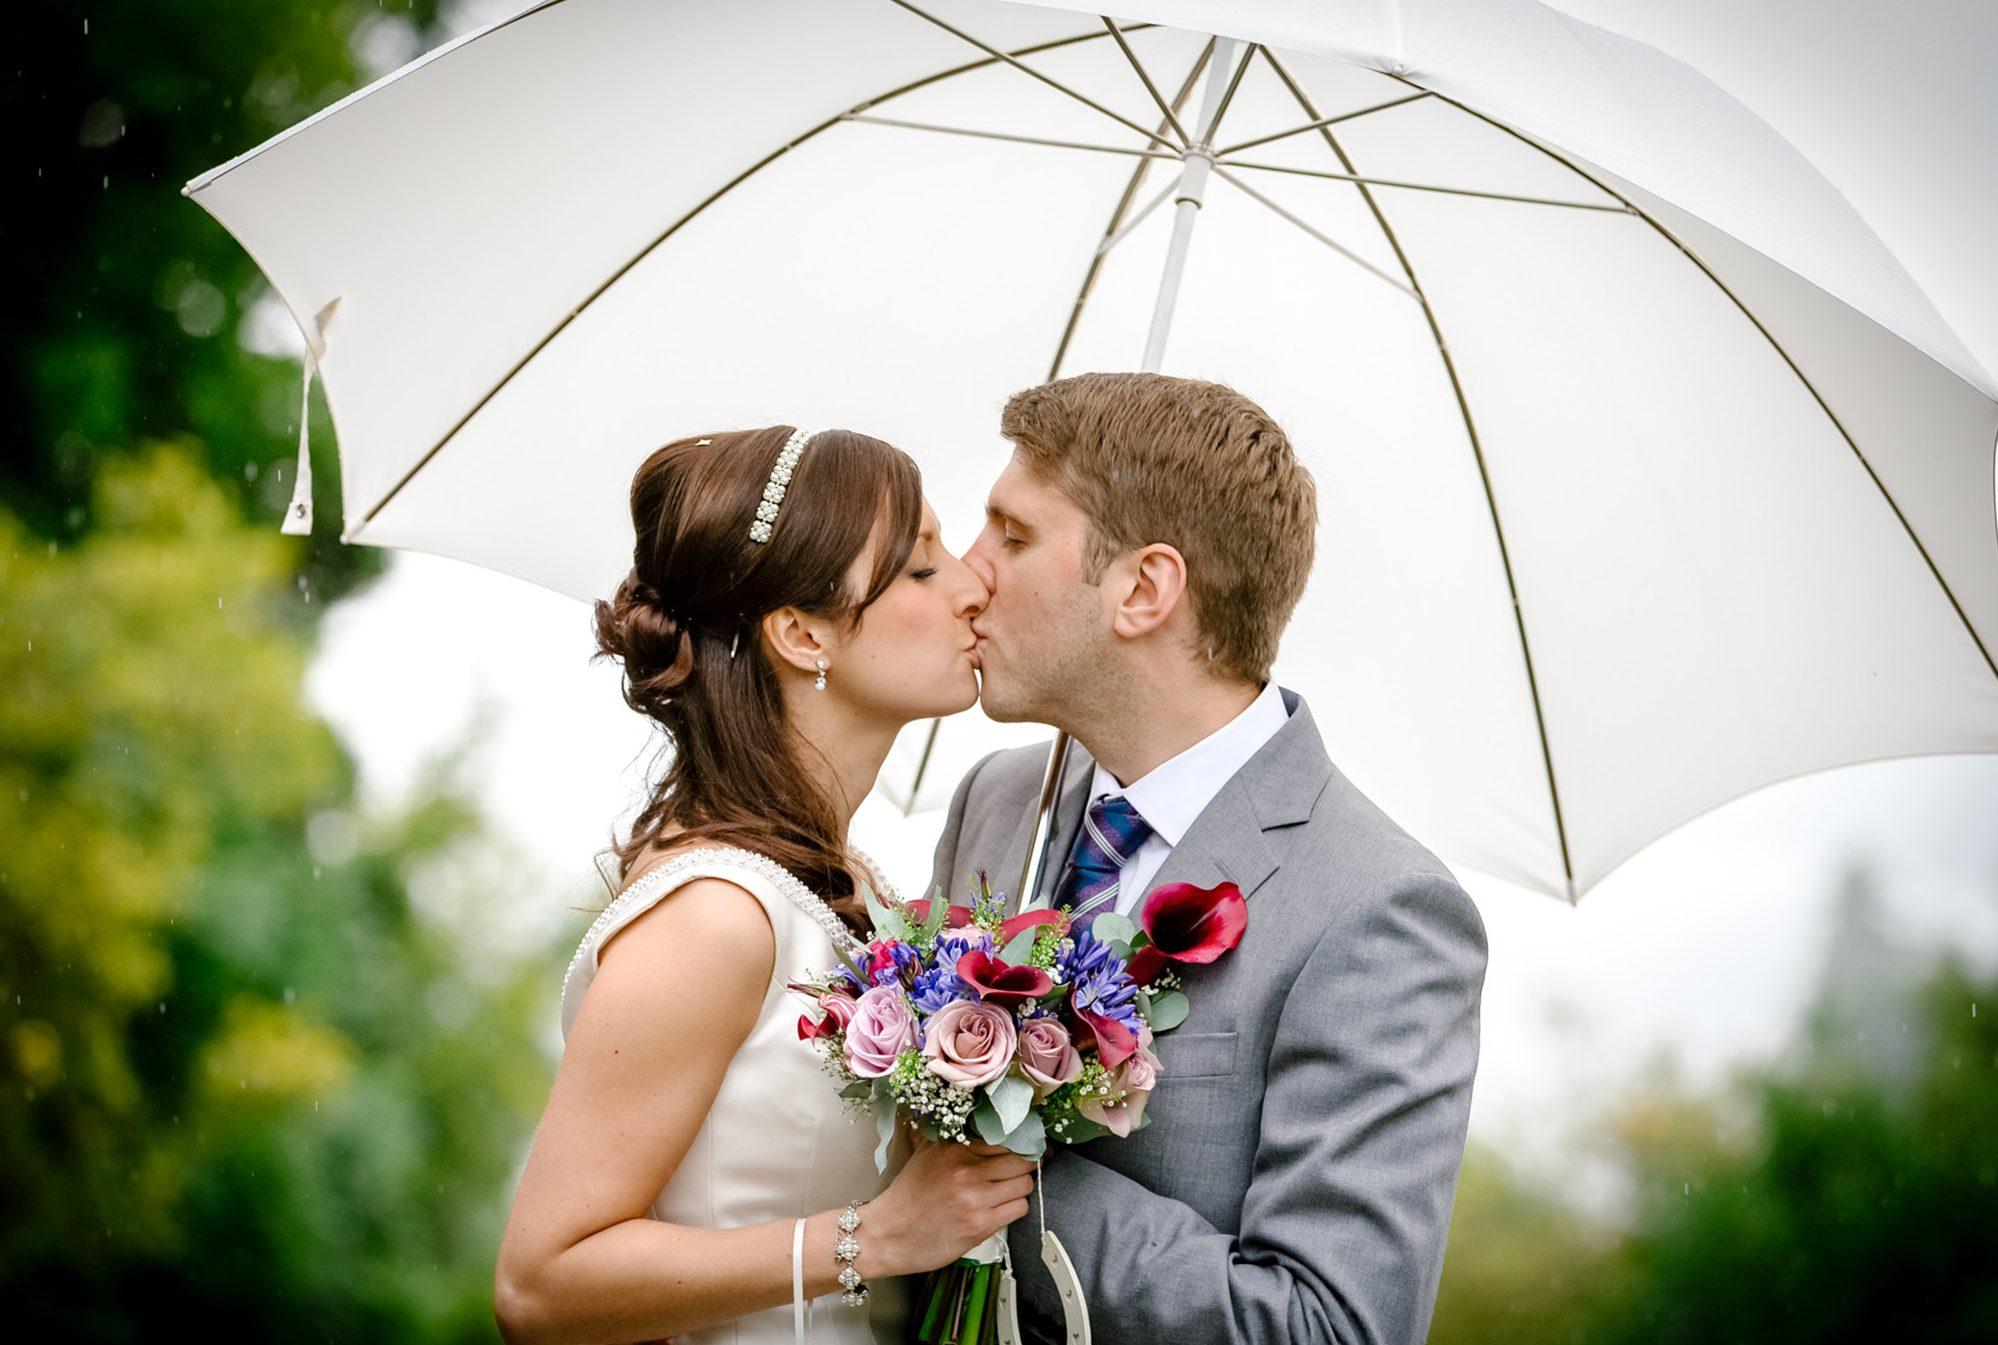 Bride and groom beneath an umbrella - Candid outdoor wedding photography